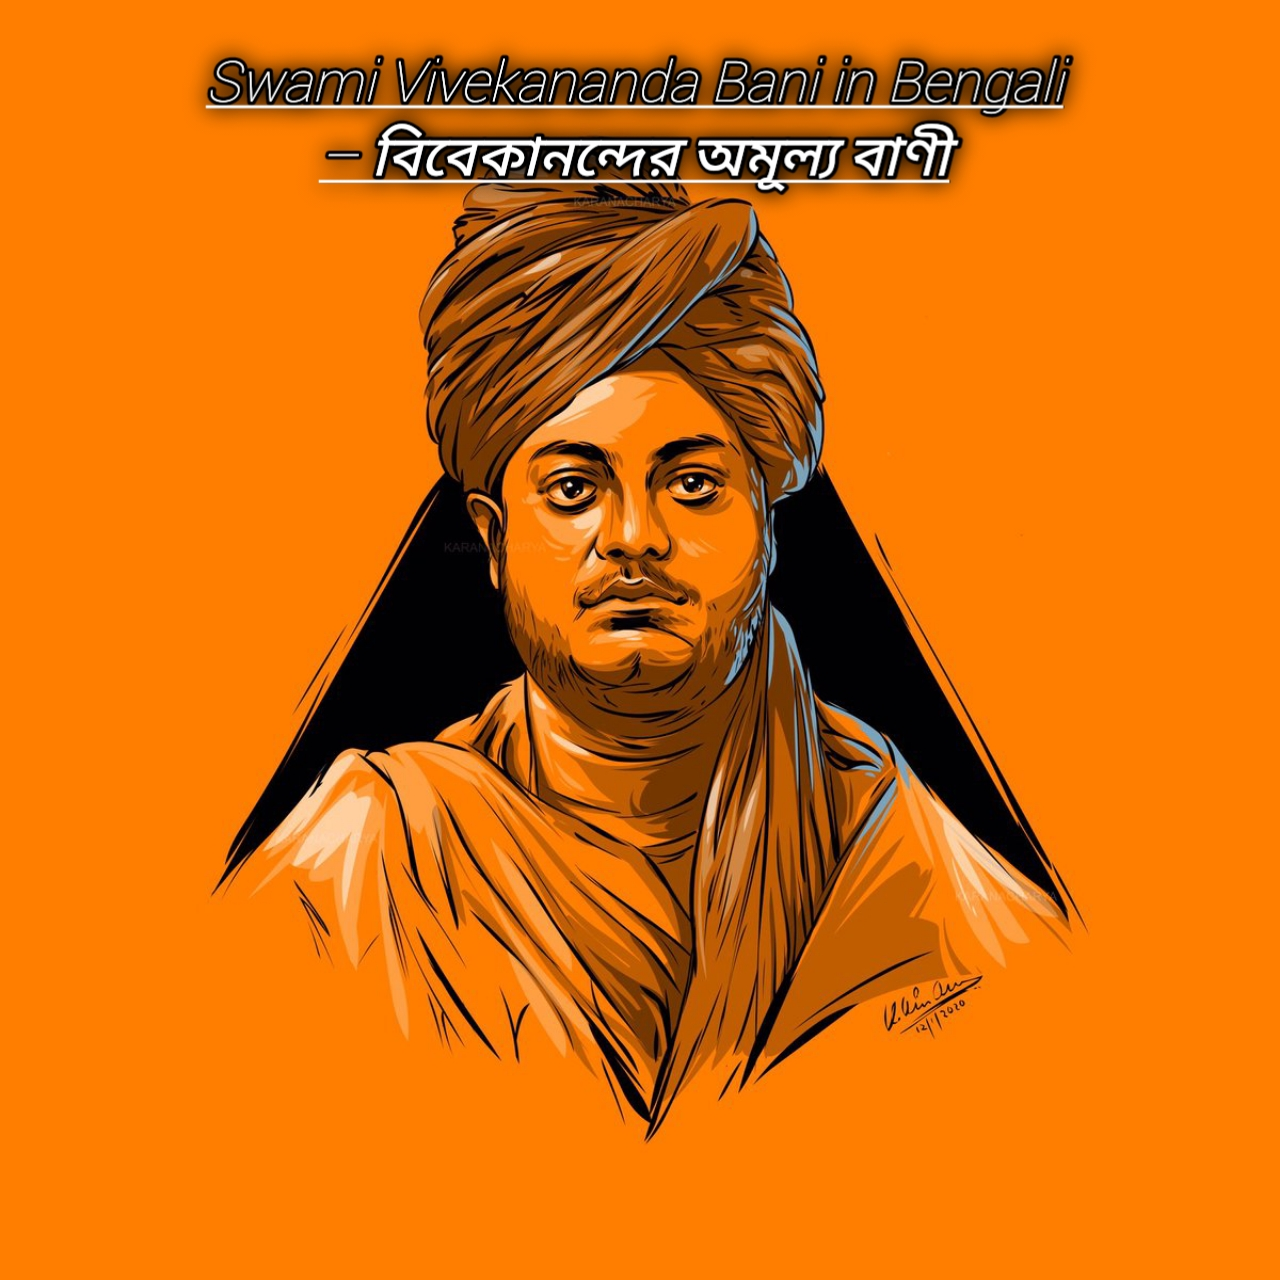 Swami Vivekananda Bani in Bengali – বিবেকানন্দের অমূল্য বাণী